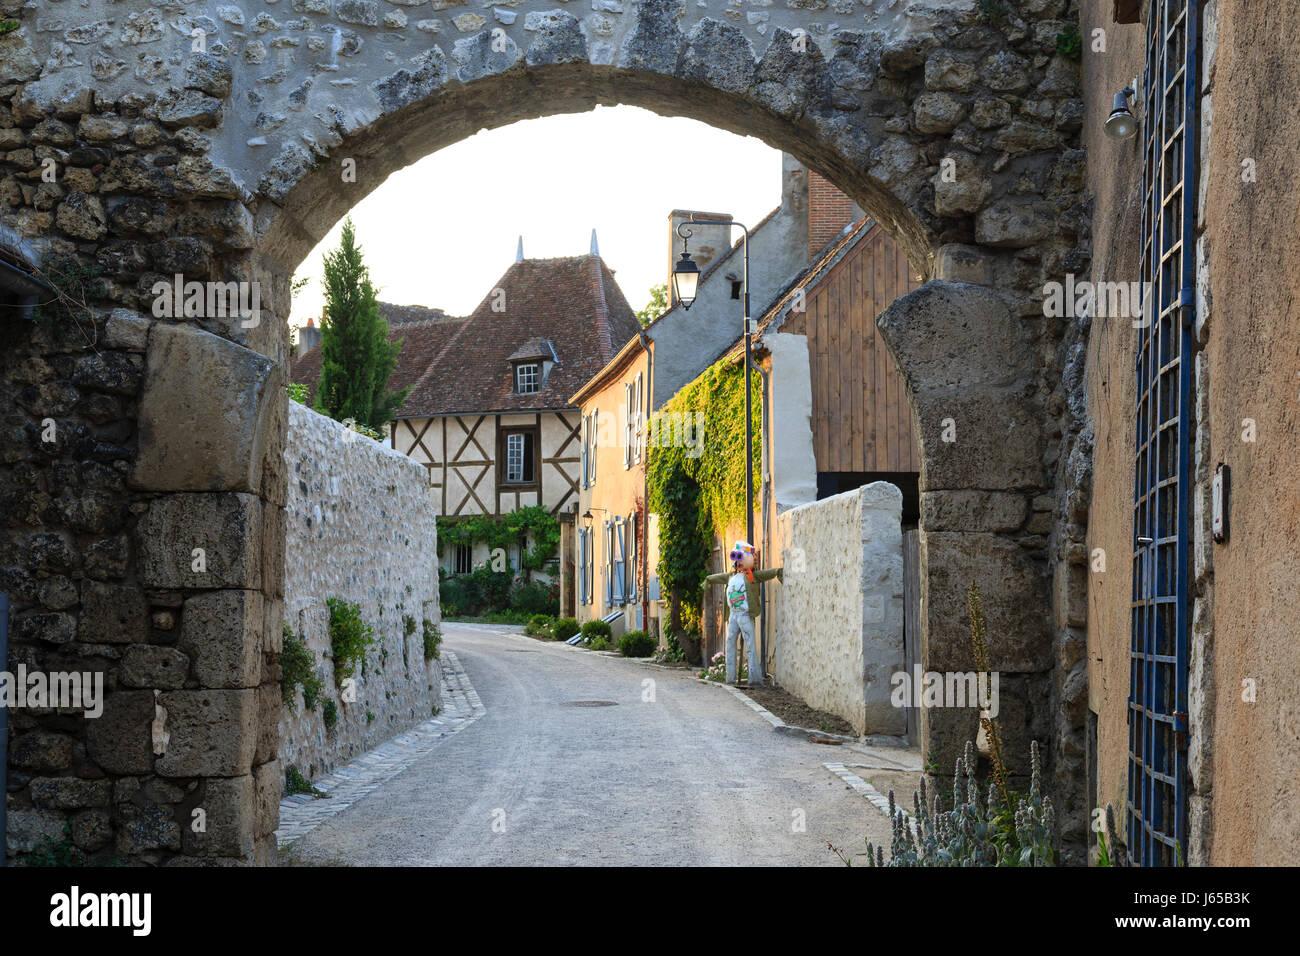 France, Allier, Verneuil en Bourbonnais, houses facing the church square Stock Photo